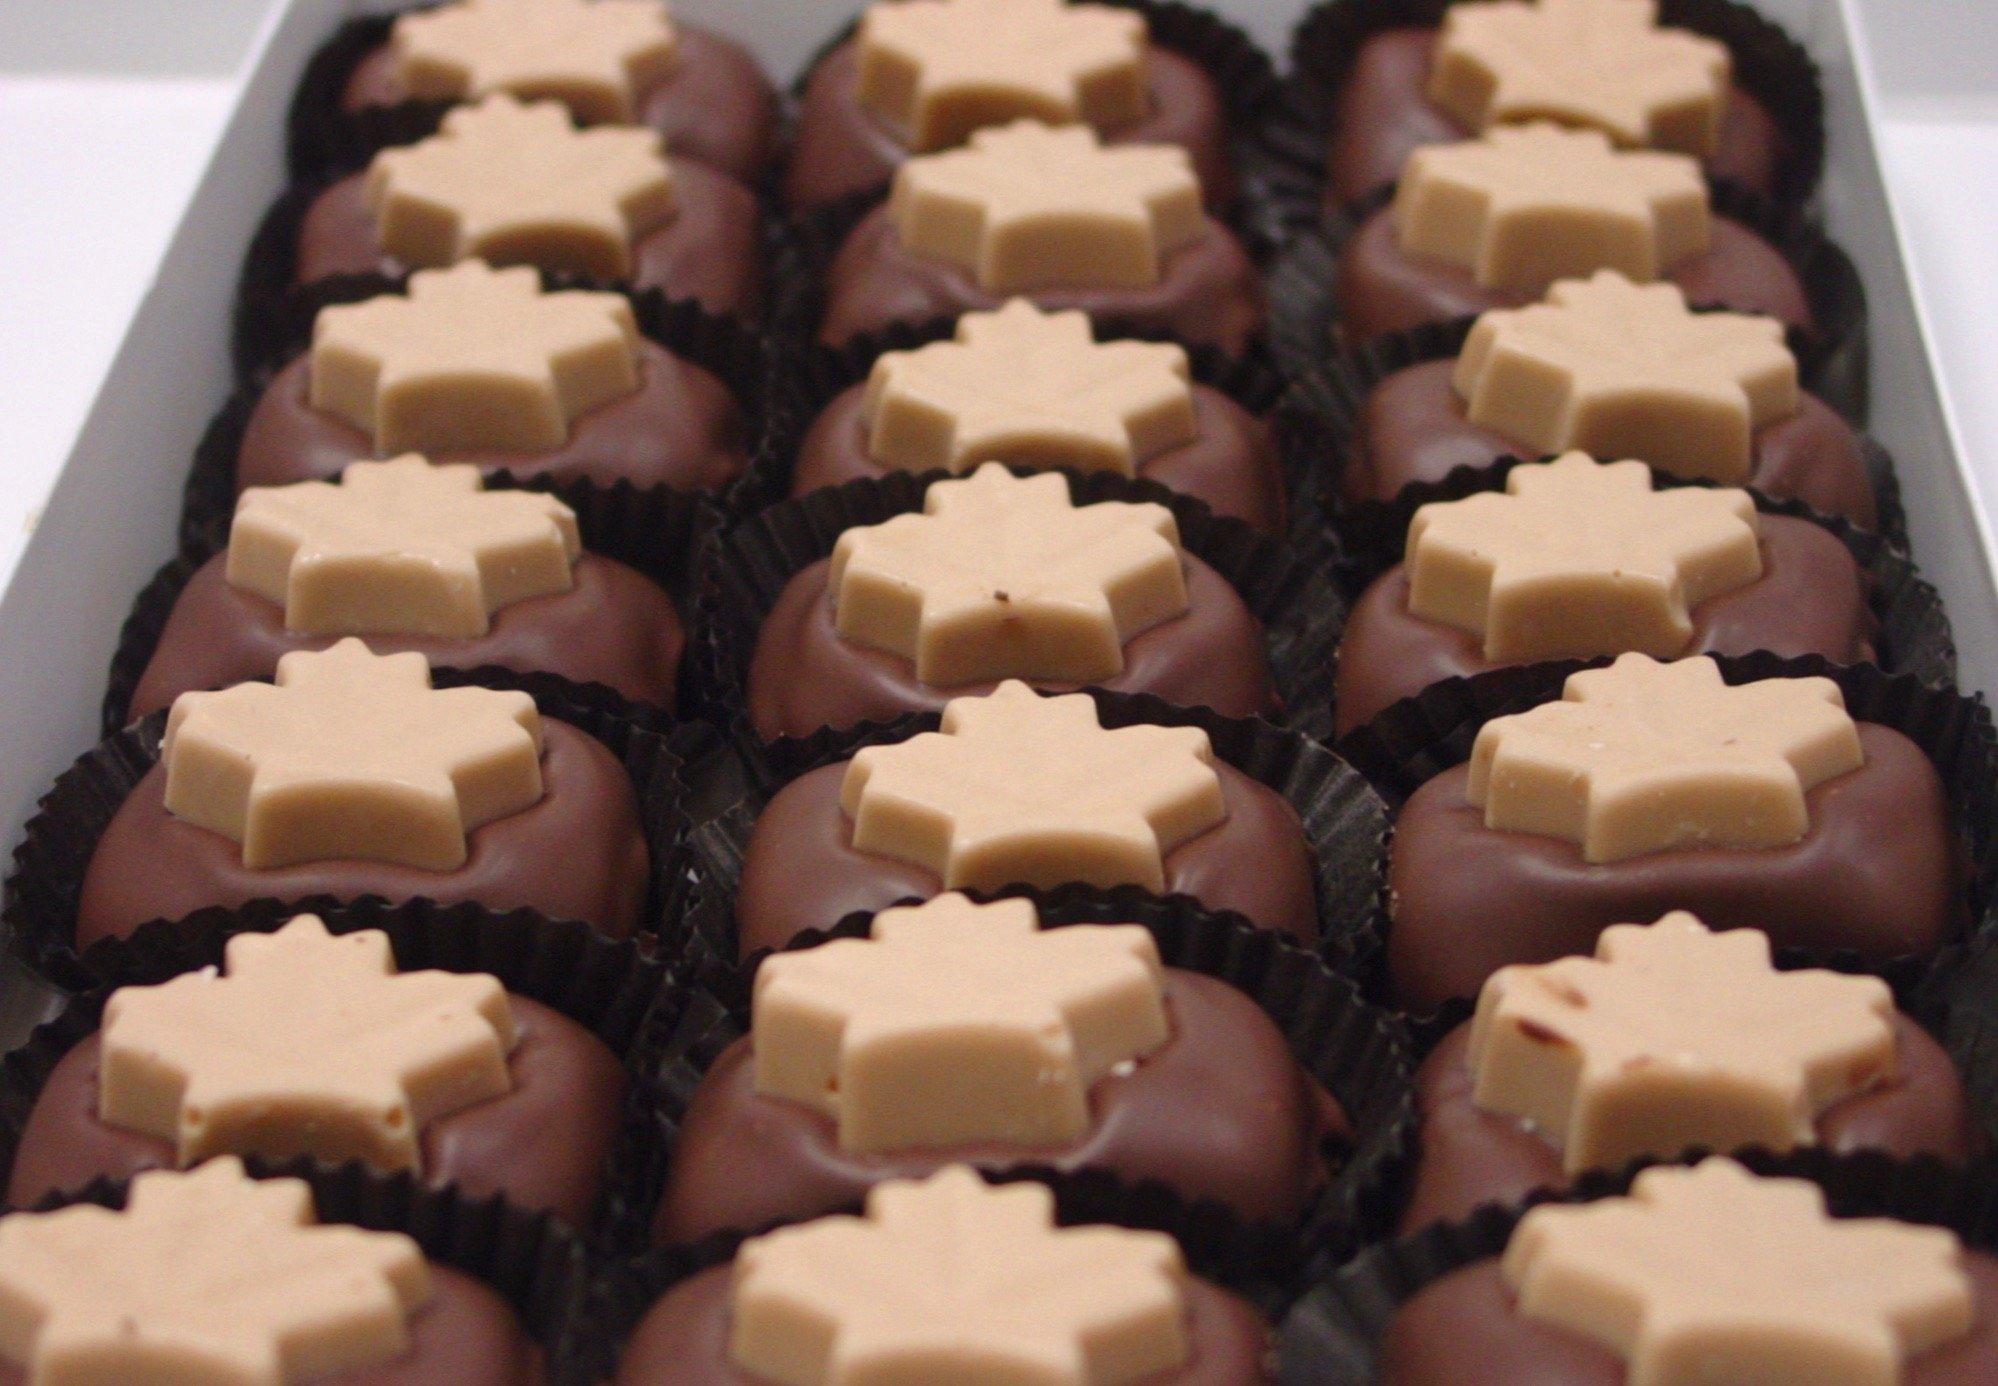 Diabeticfriendly's Sugar Free Milk Chocolate Covered Maple Creams, 21 pcs 18 oz by Diabetic Friendly